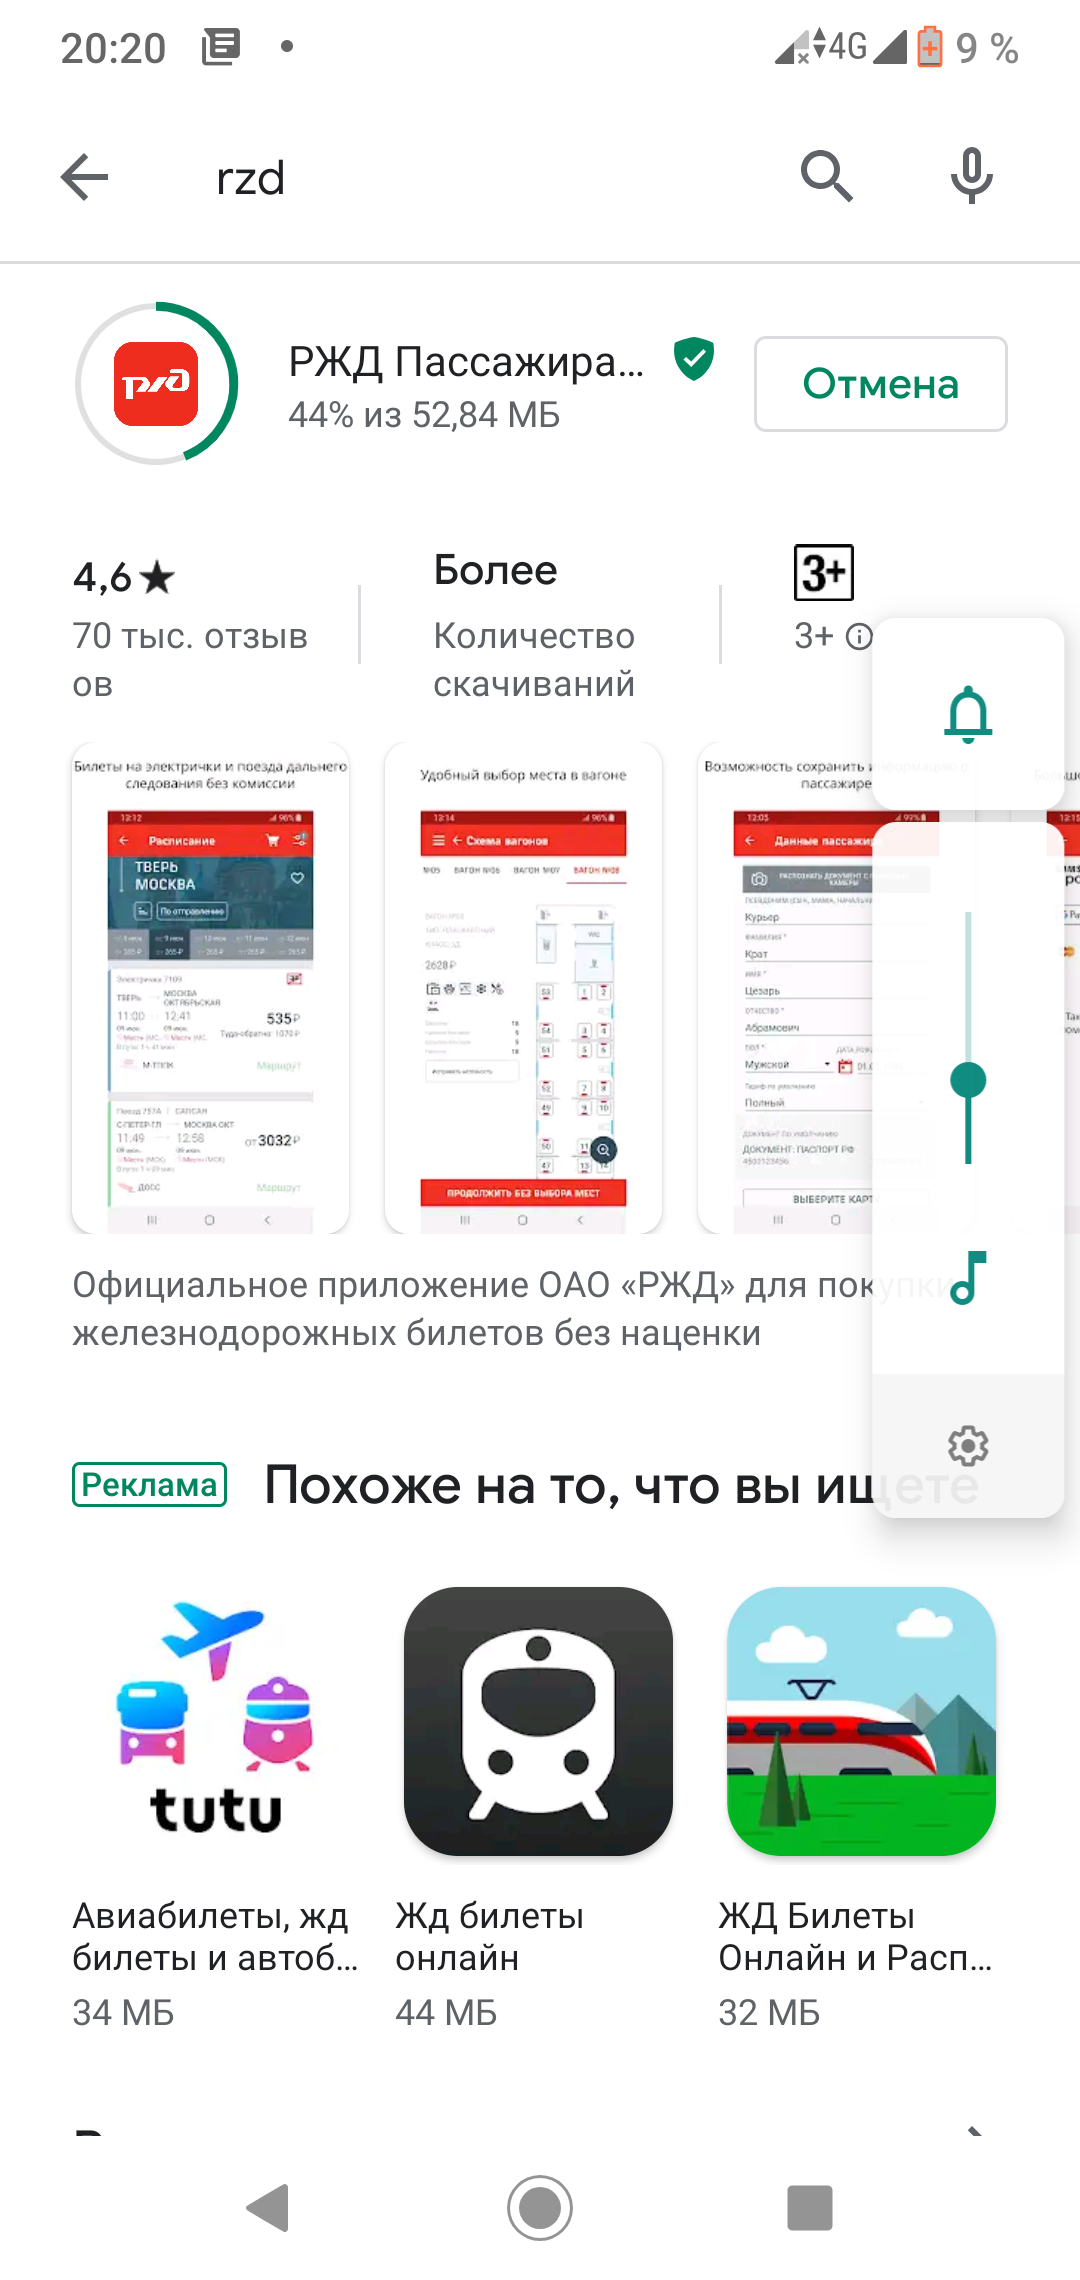 httpstools.seoinsane.rufilesimages5721ustanovka-prilozheniya-4.png